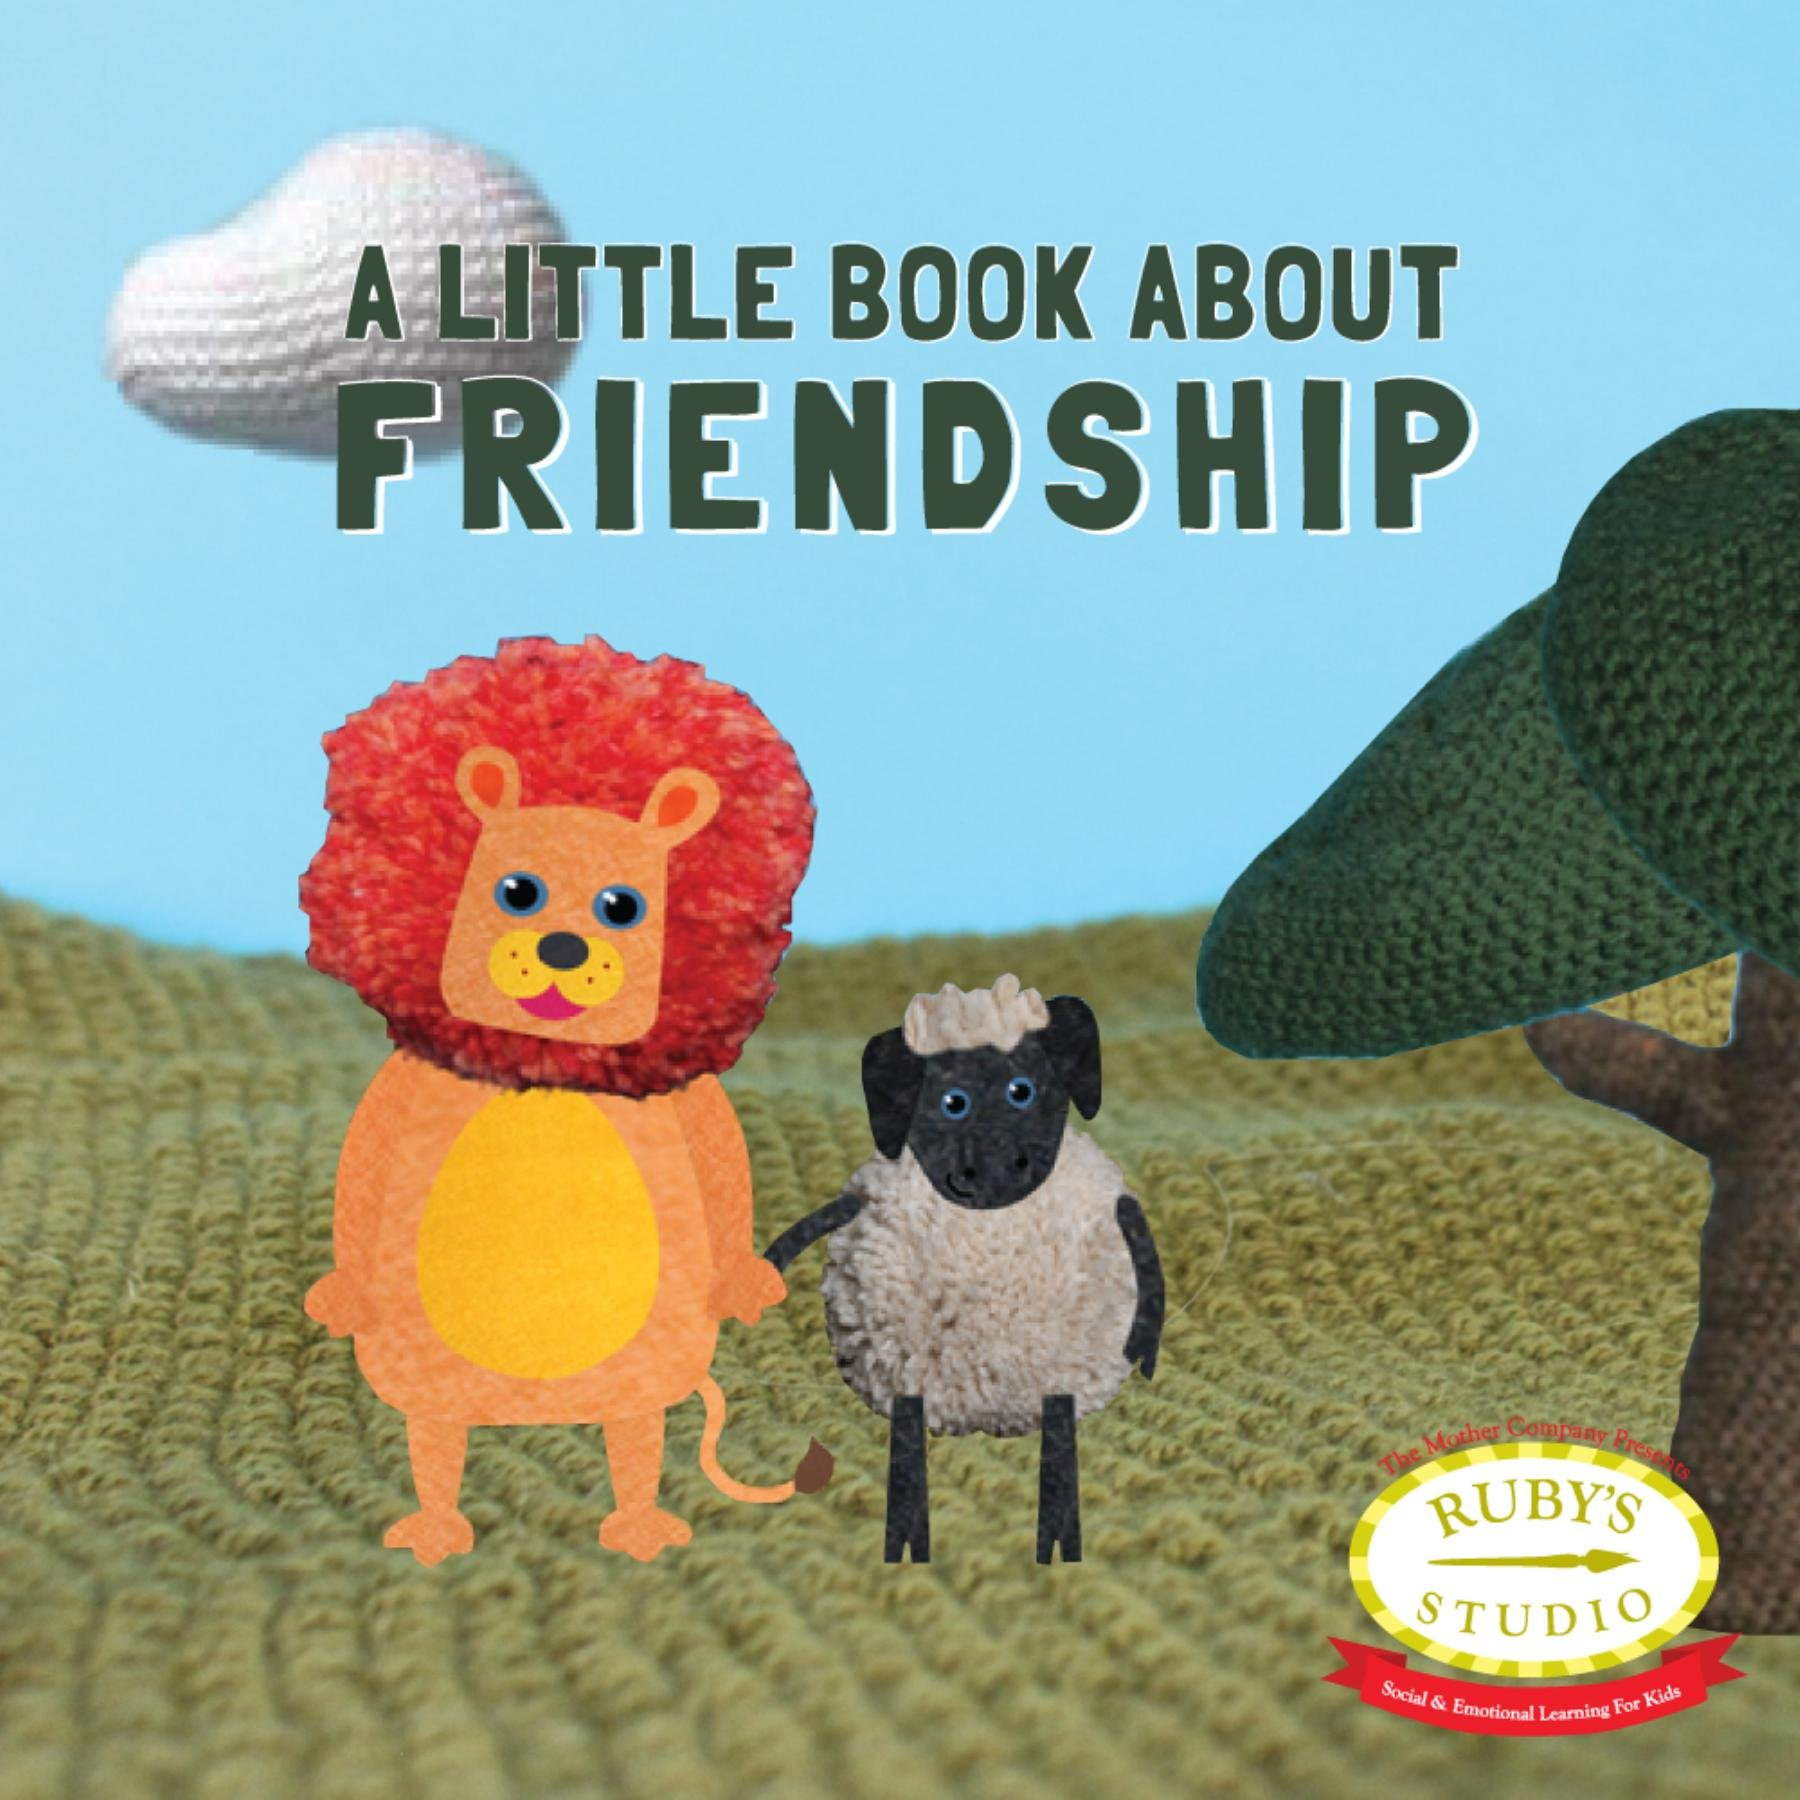 A Little Book About Friendship